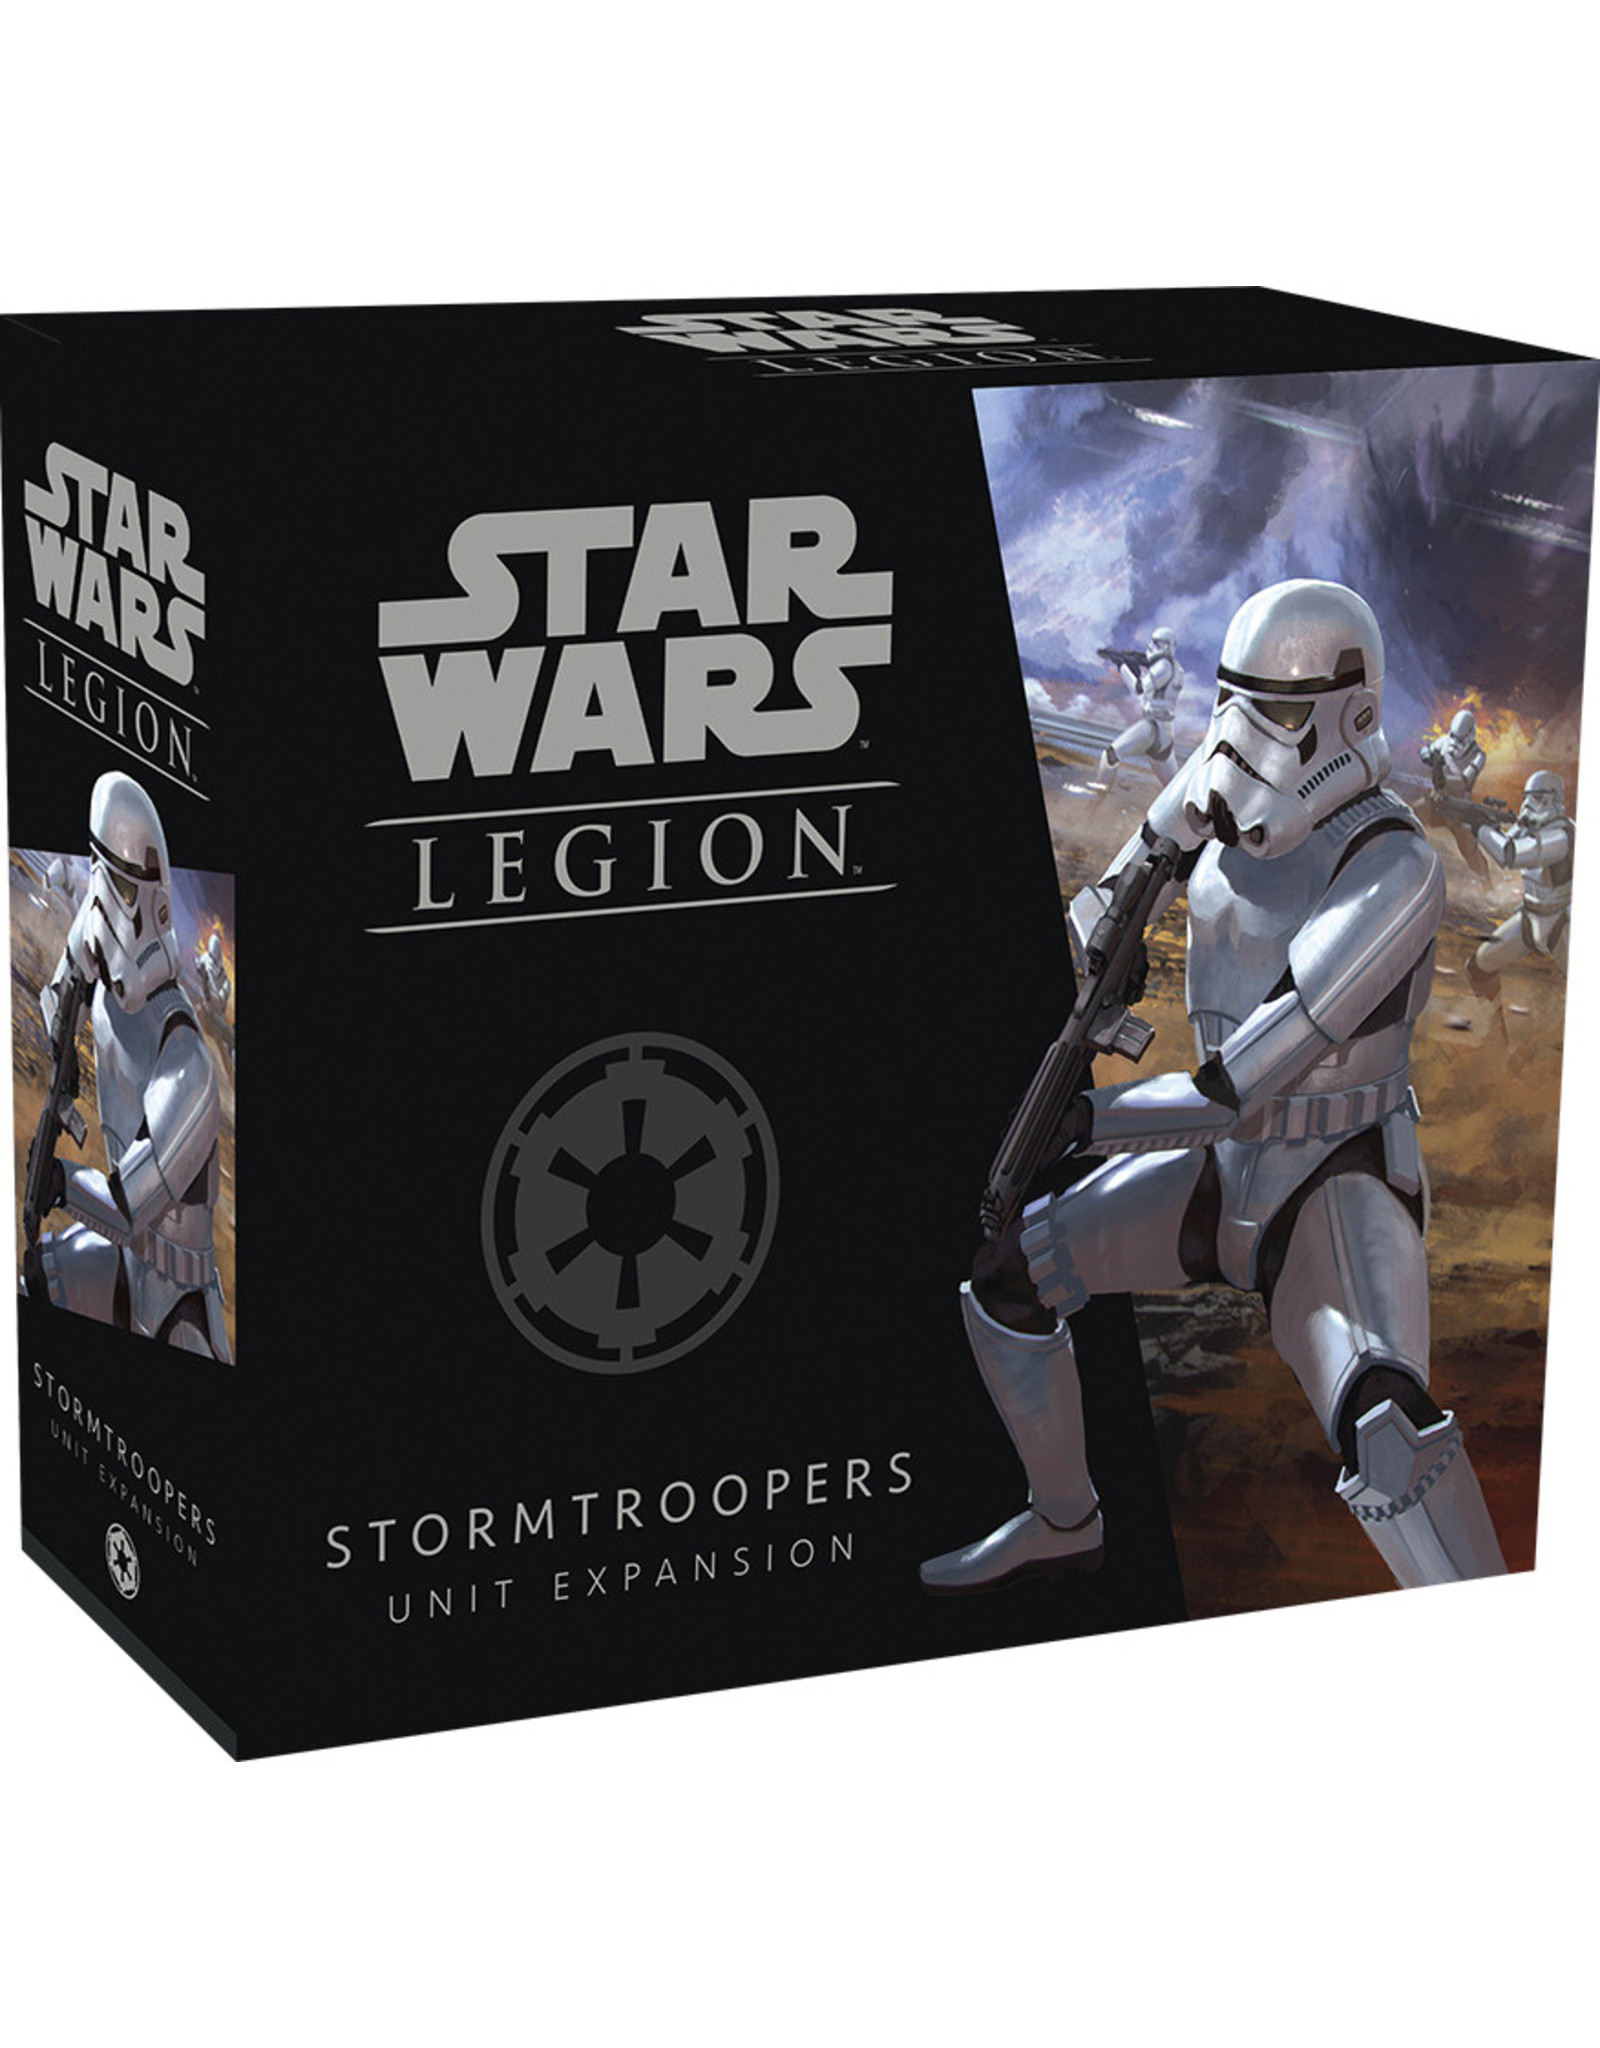 Star Wars: Legion - Stormtroopers